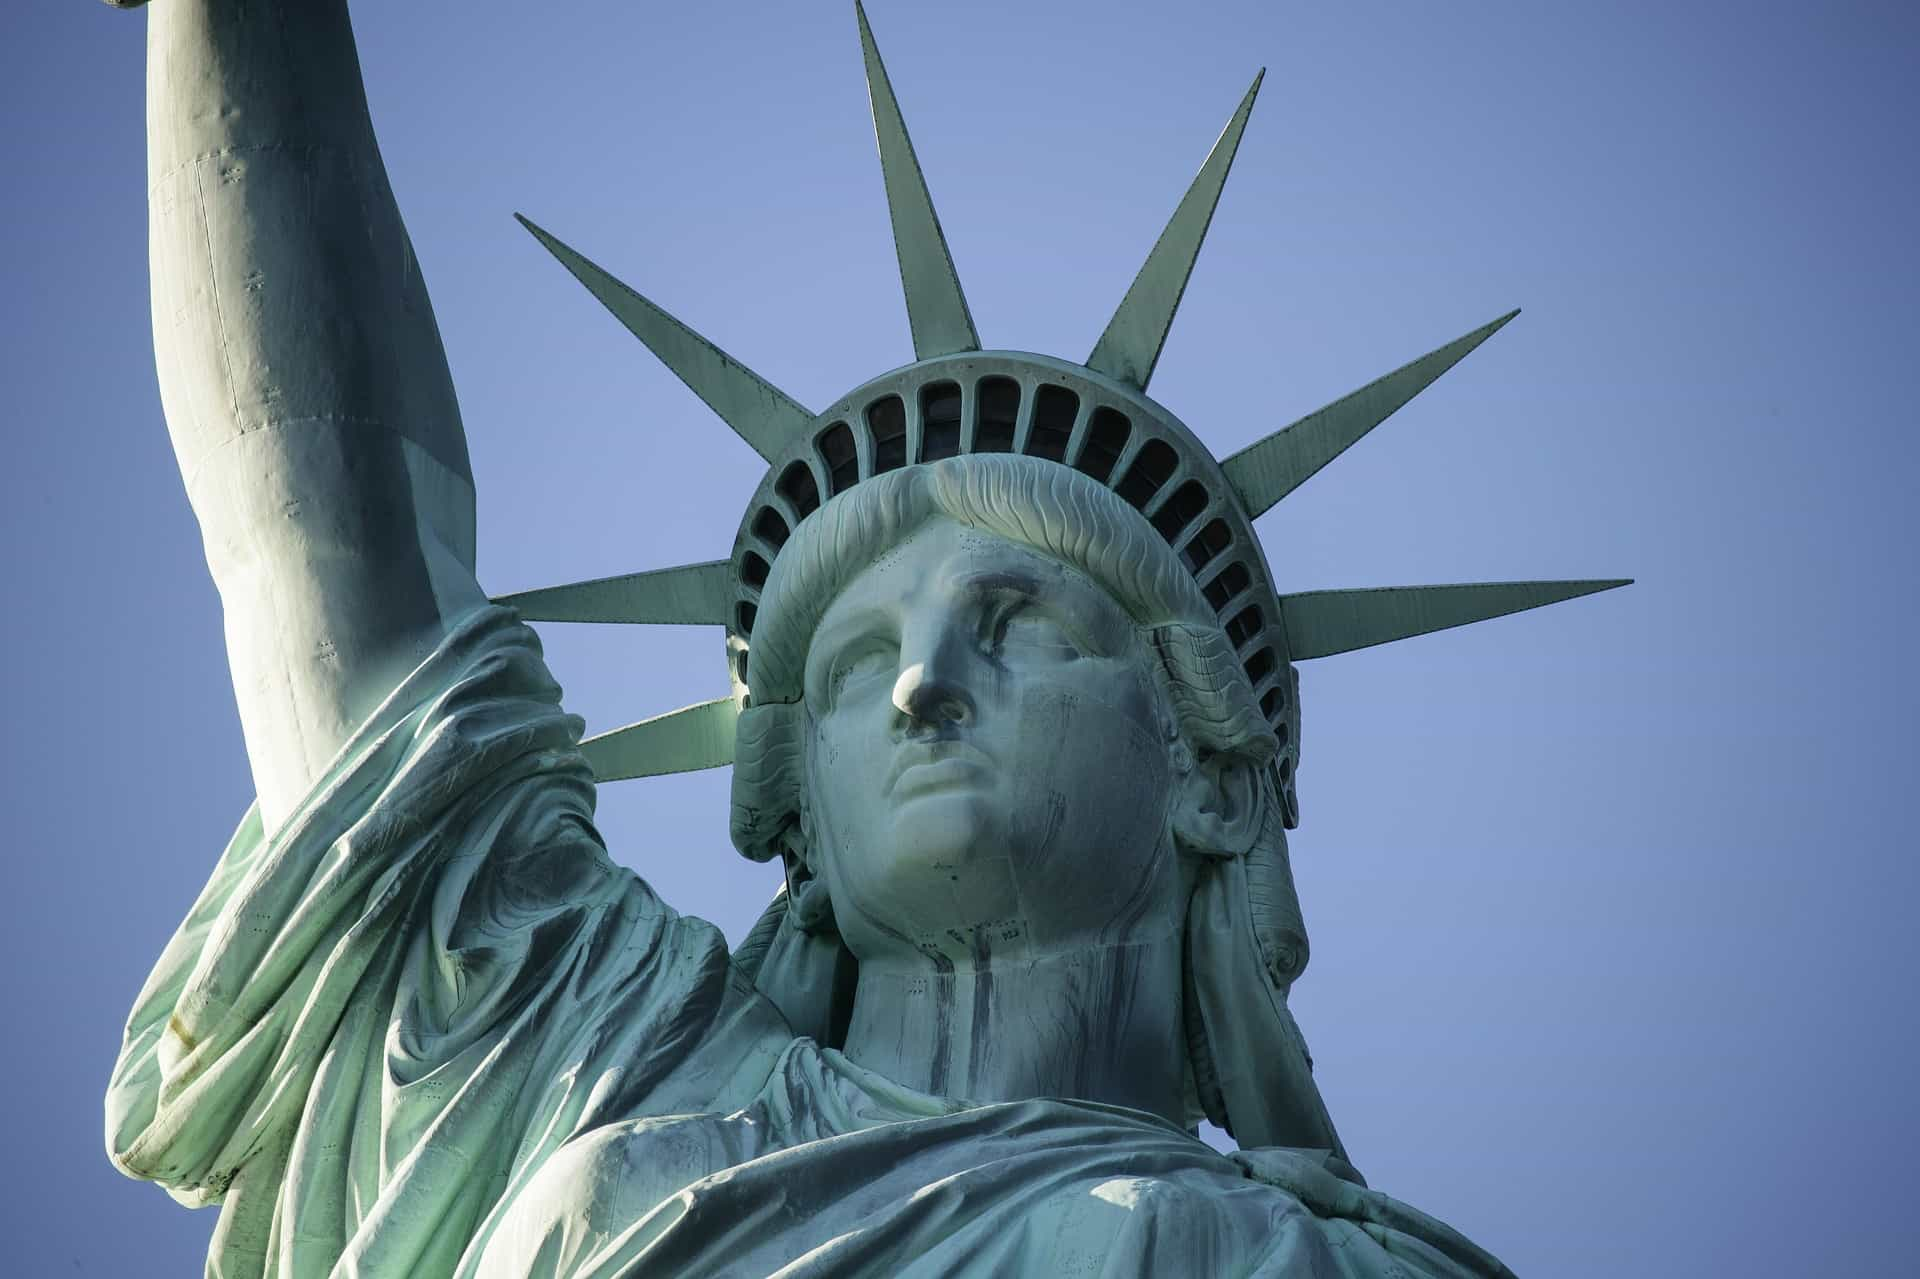 statue-of-liberty-828665_1920